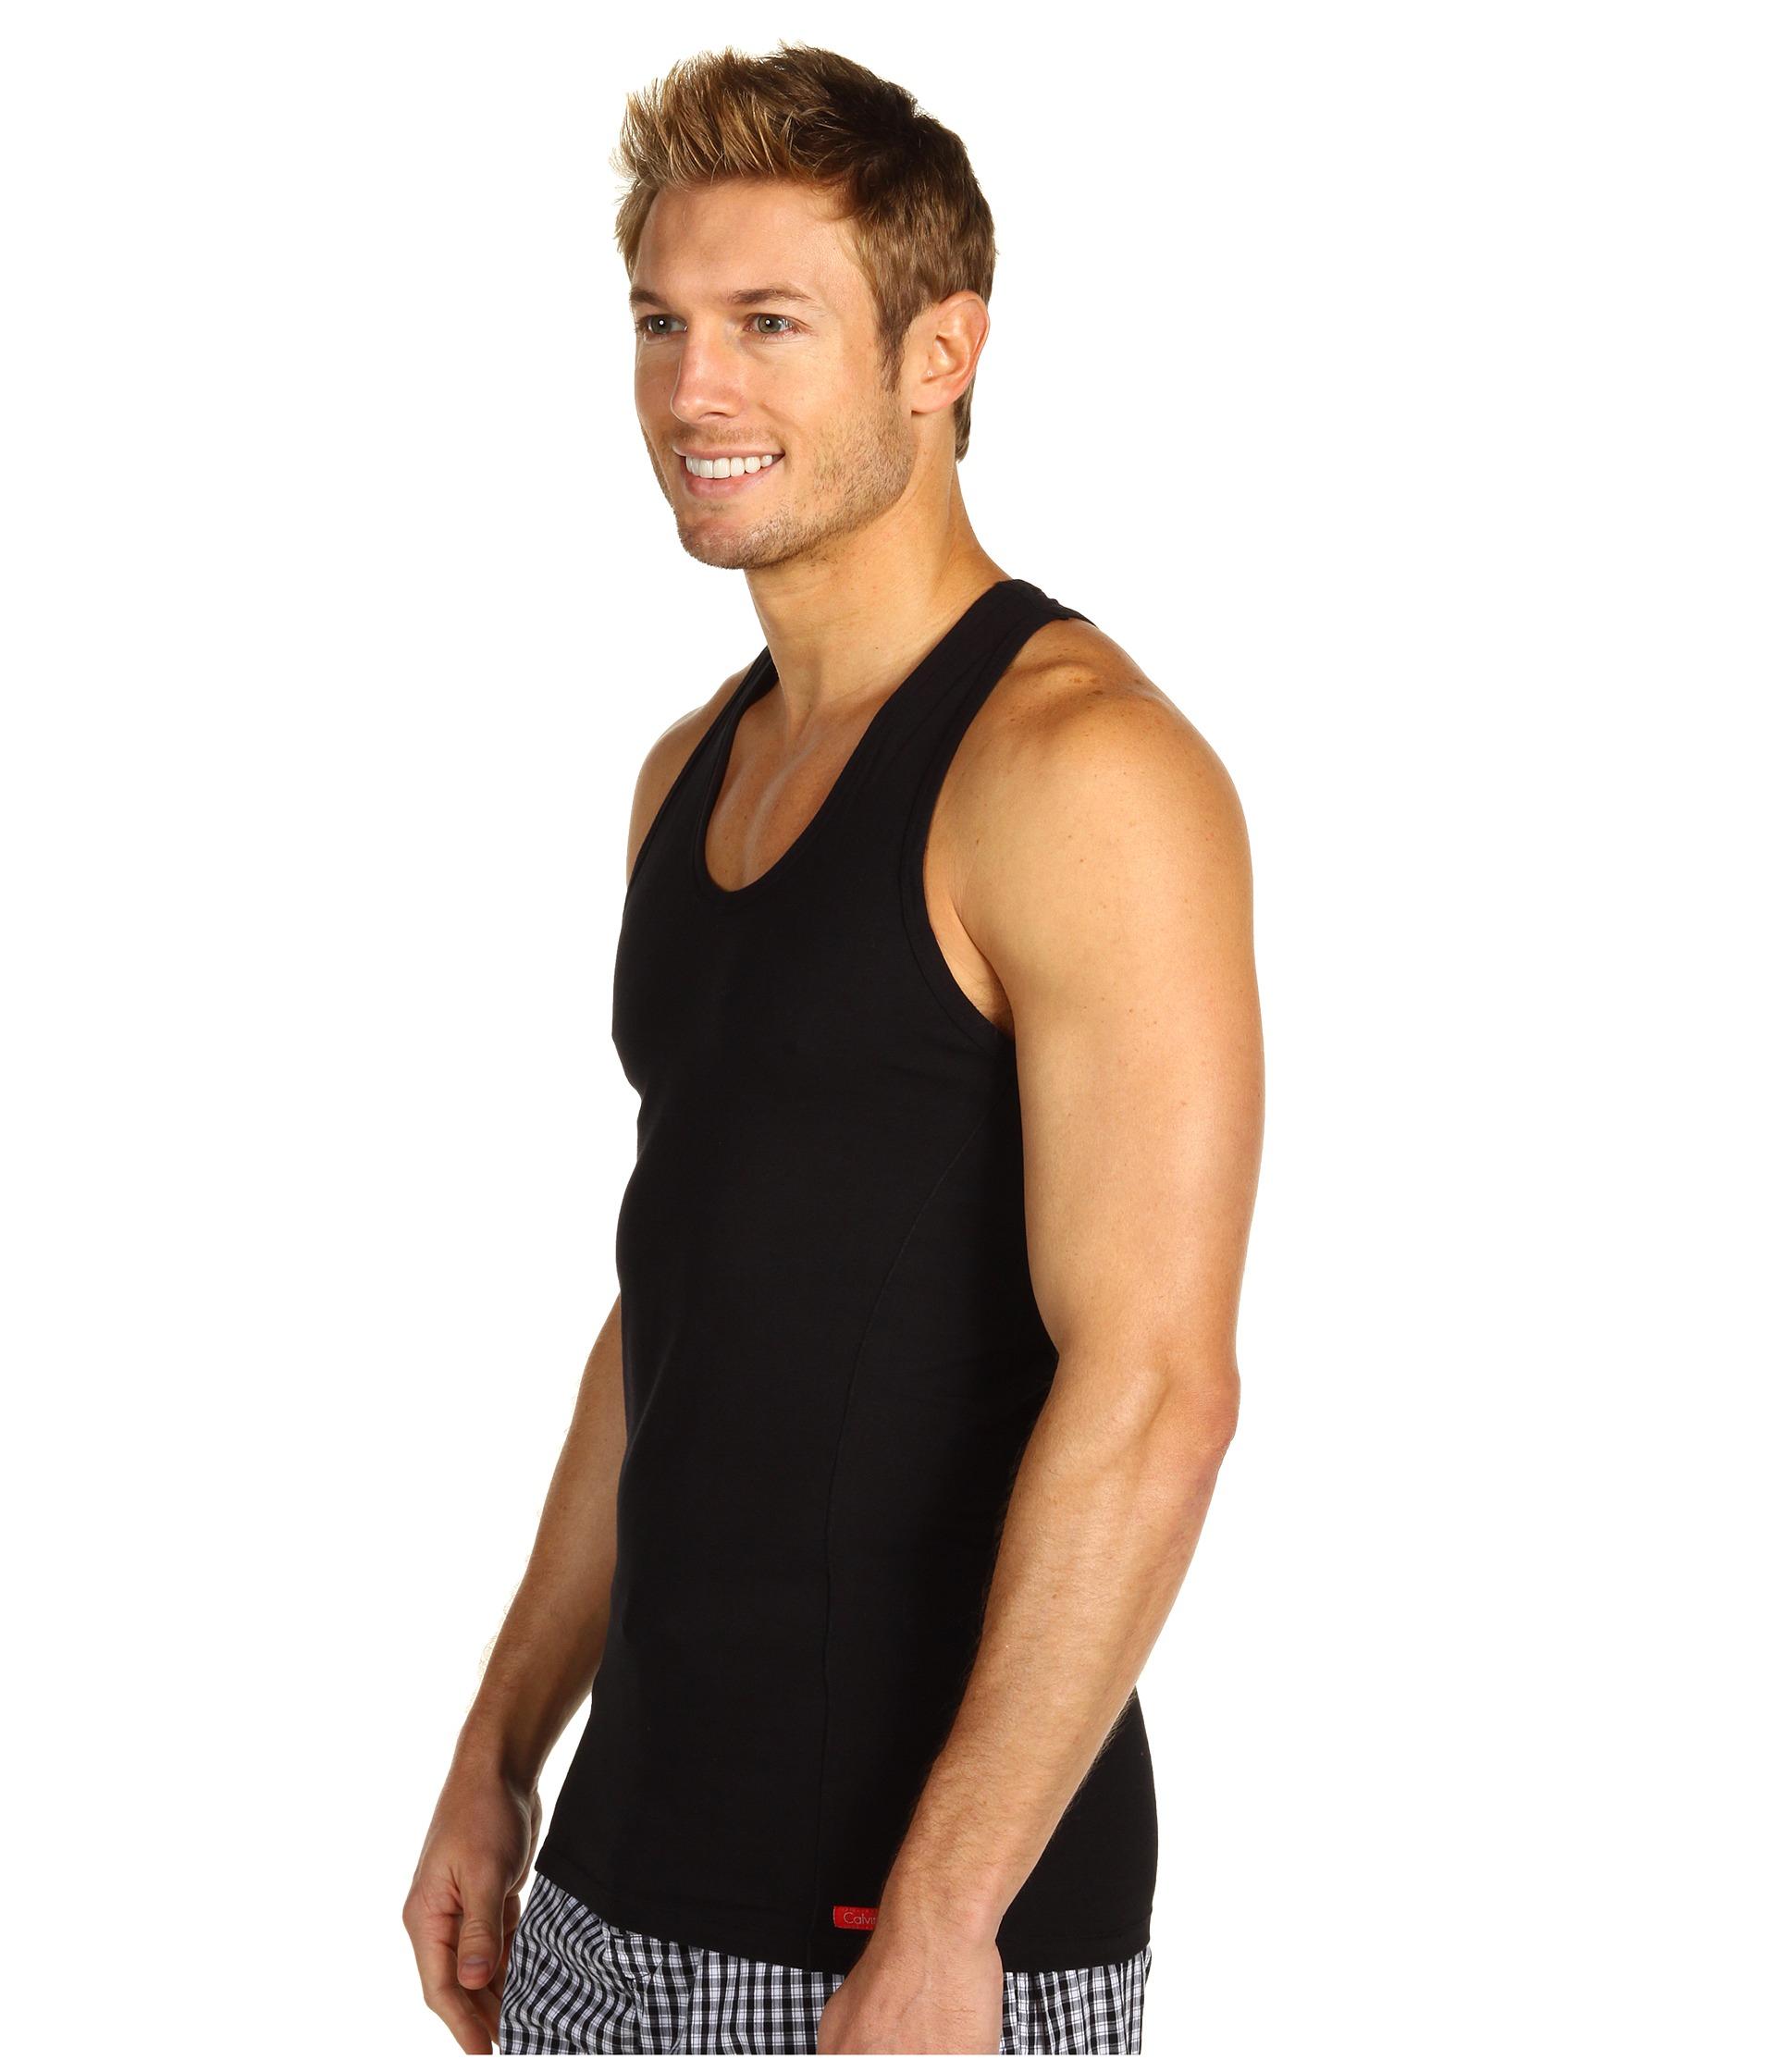 cbb59b3336cd6 Lyst - Calvin Klein Pro Stretch Slim Fit Tank in Black for Men